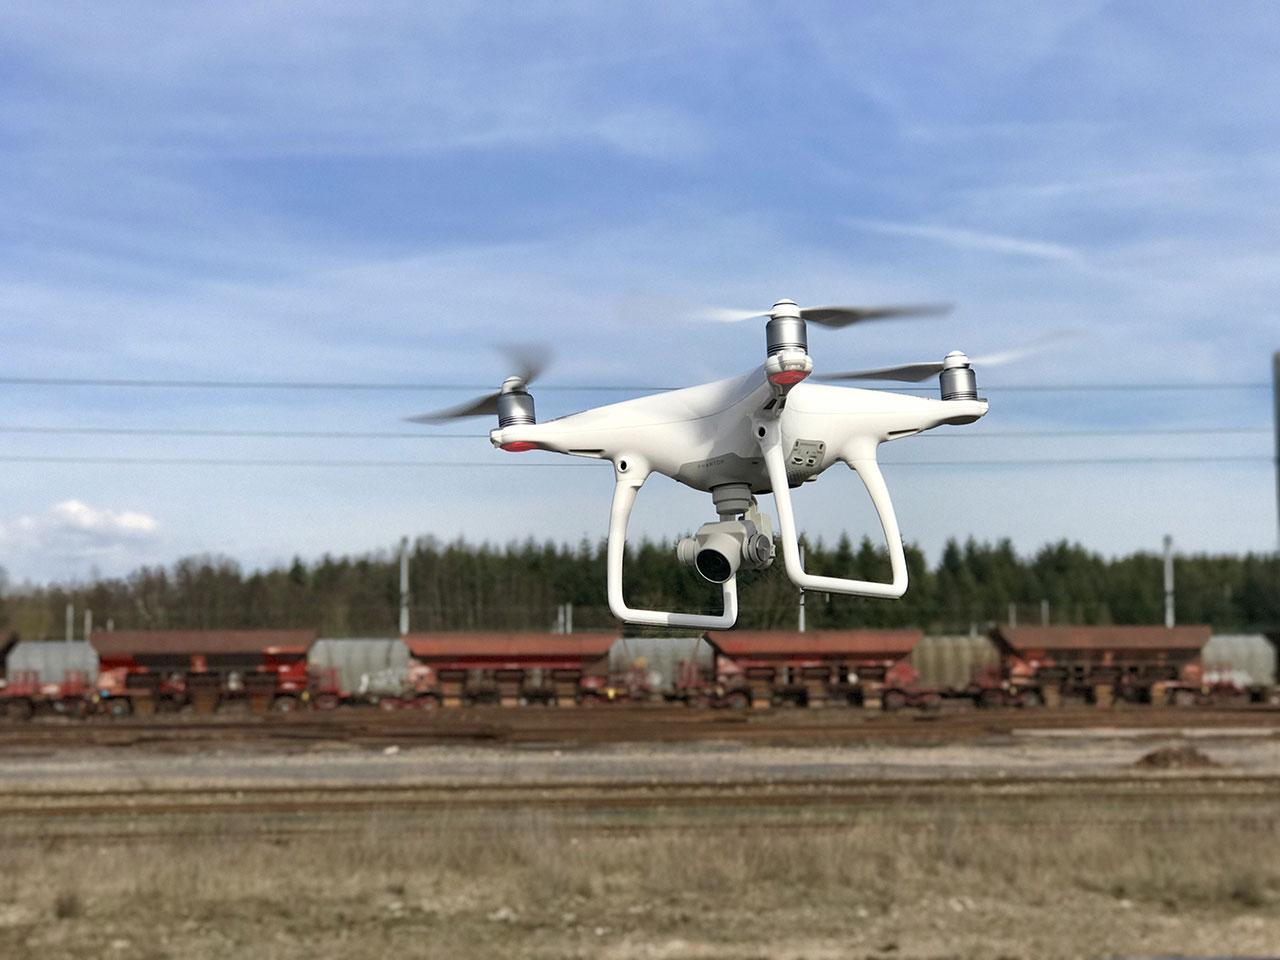 drupal-figure1-drone-phantom-4-equipe-dun-appareil-photo-pour-la-photogrammetrie.jpg